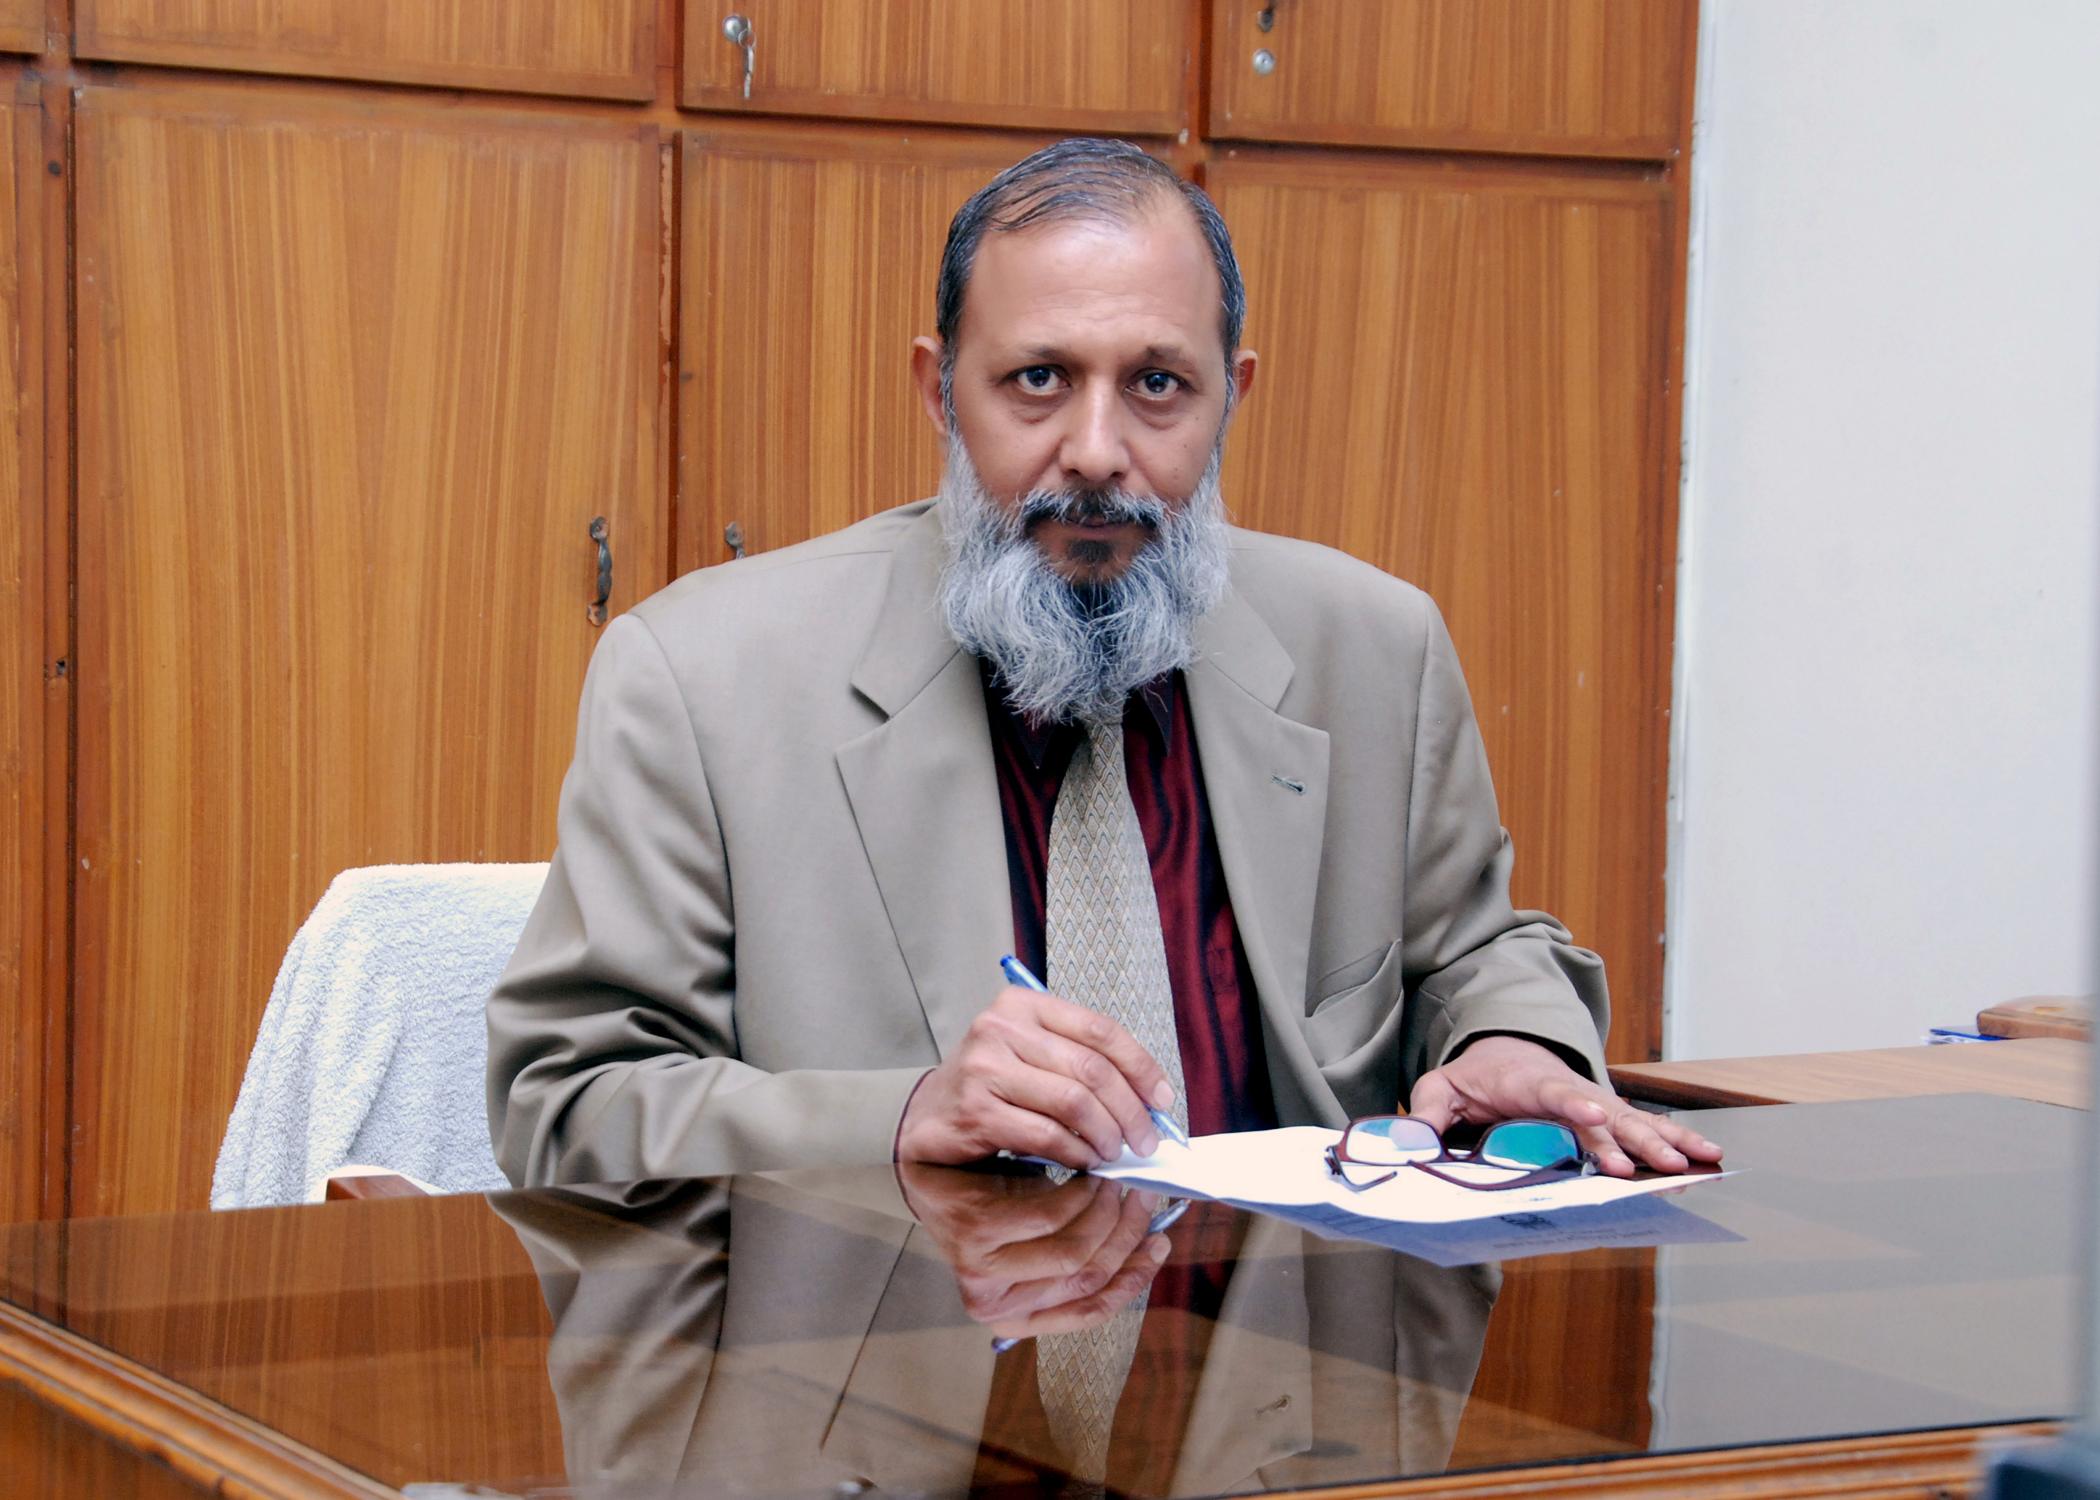 Mr. Muhammad Irfan-ul-Haq